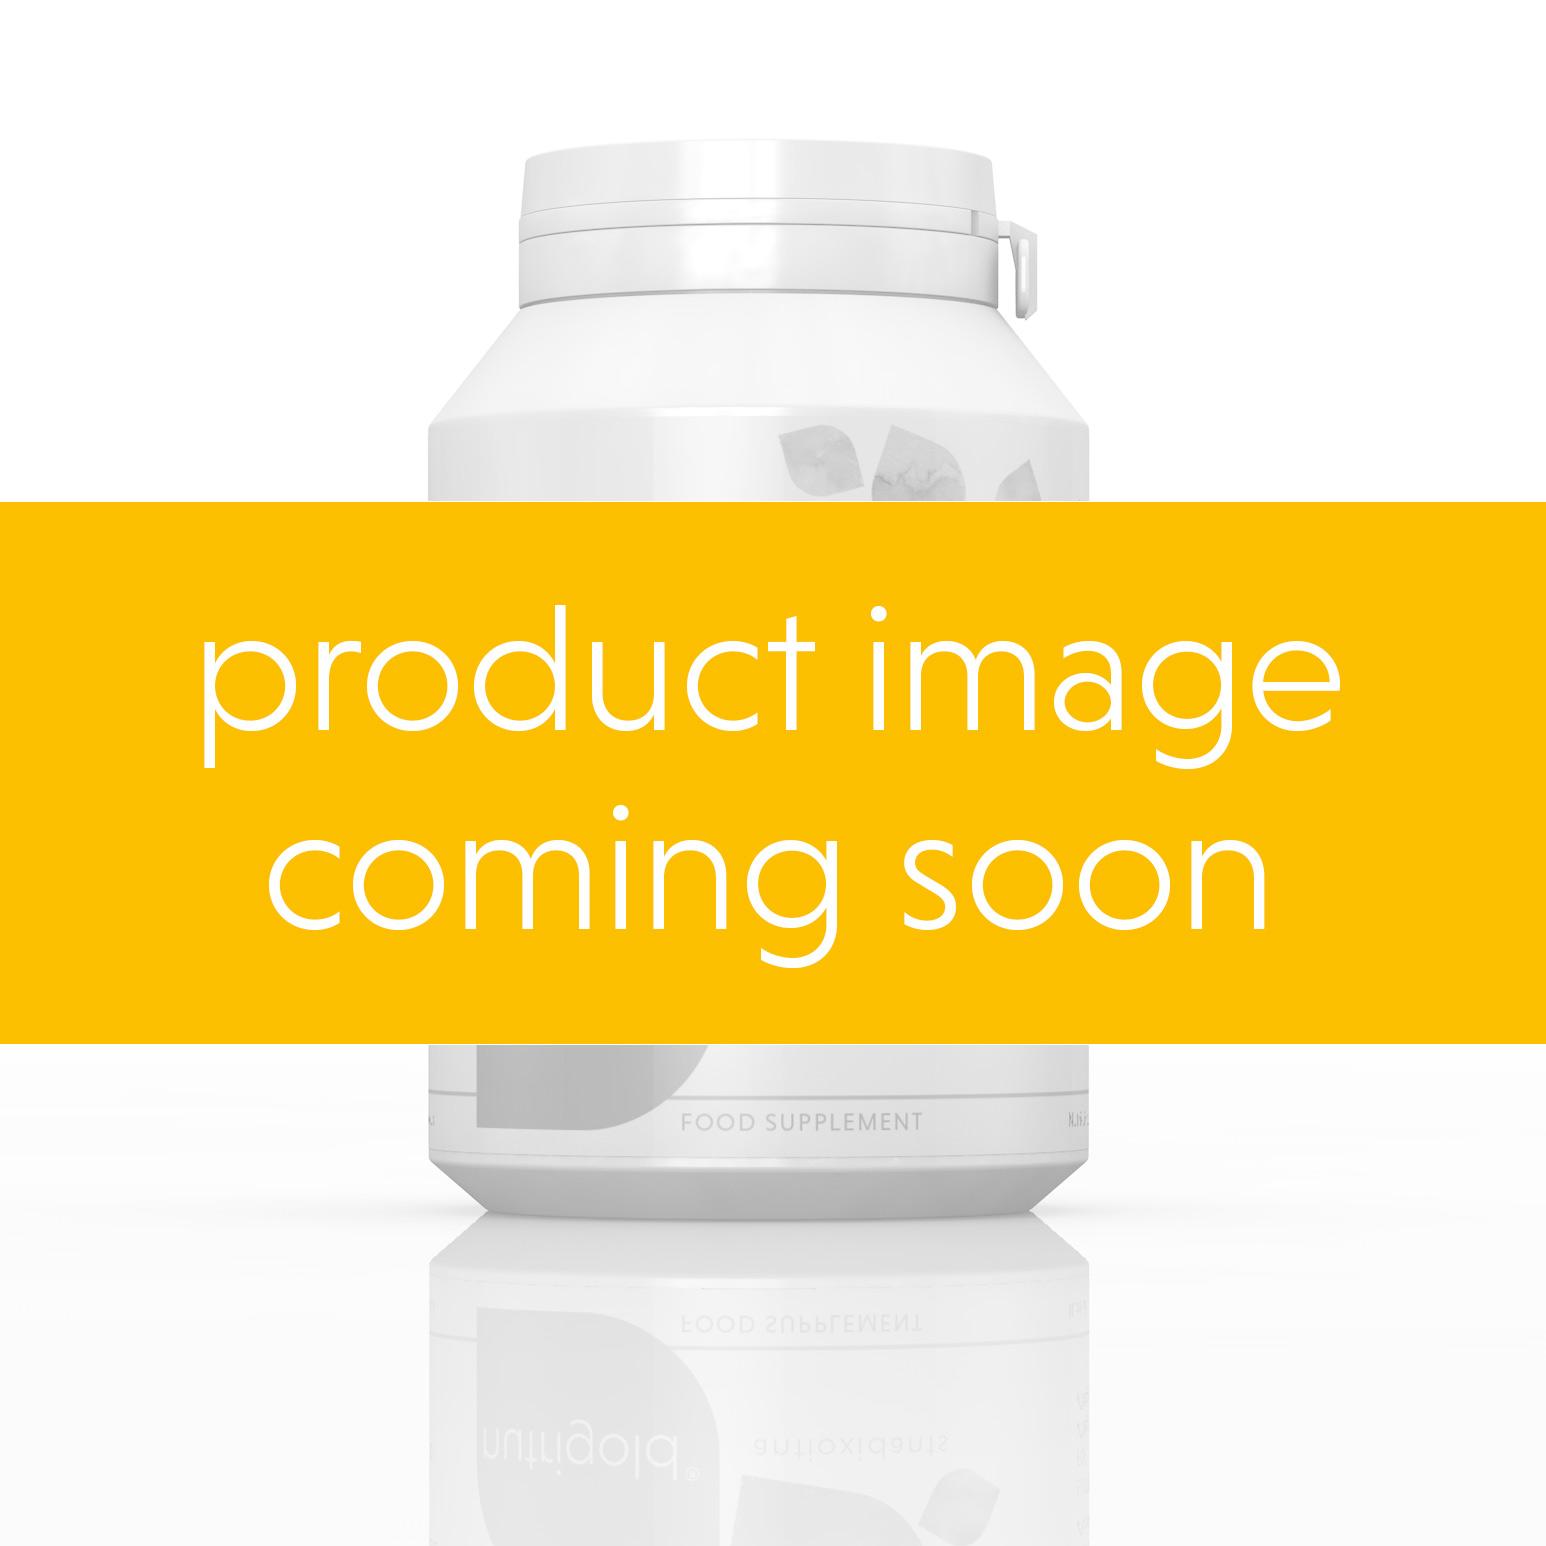 Vitamin C With Citrus Bioflavanoids x 60 Tablets